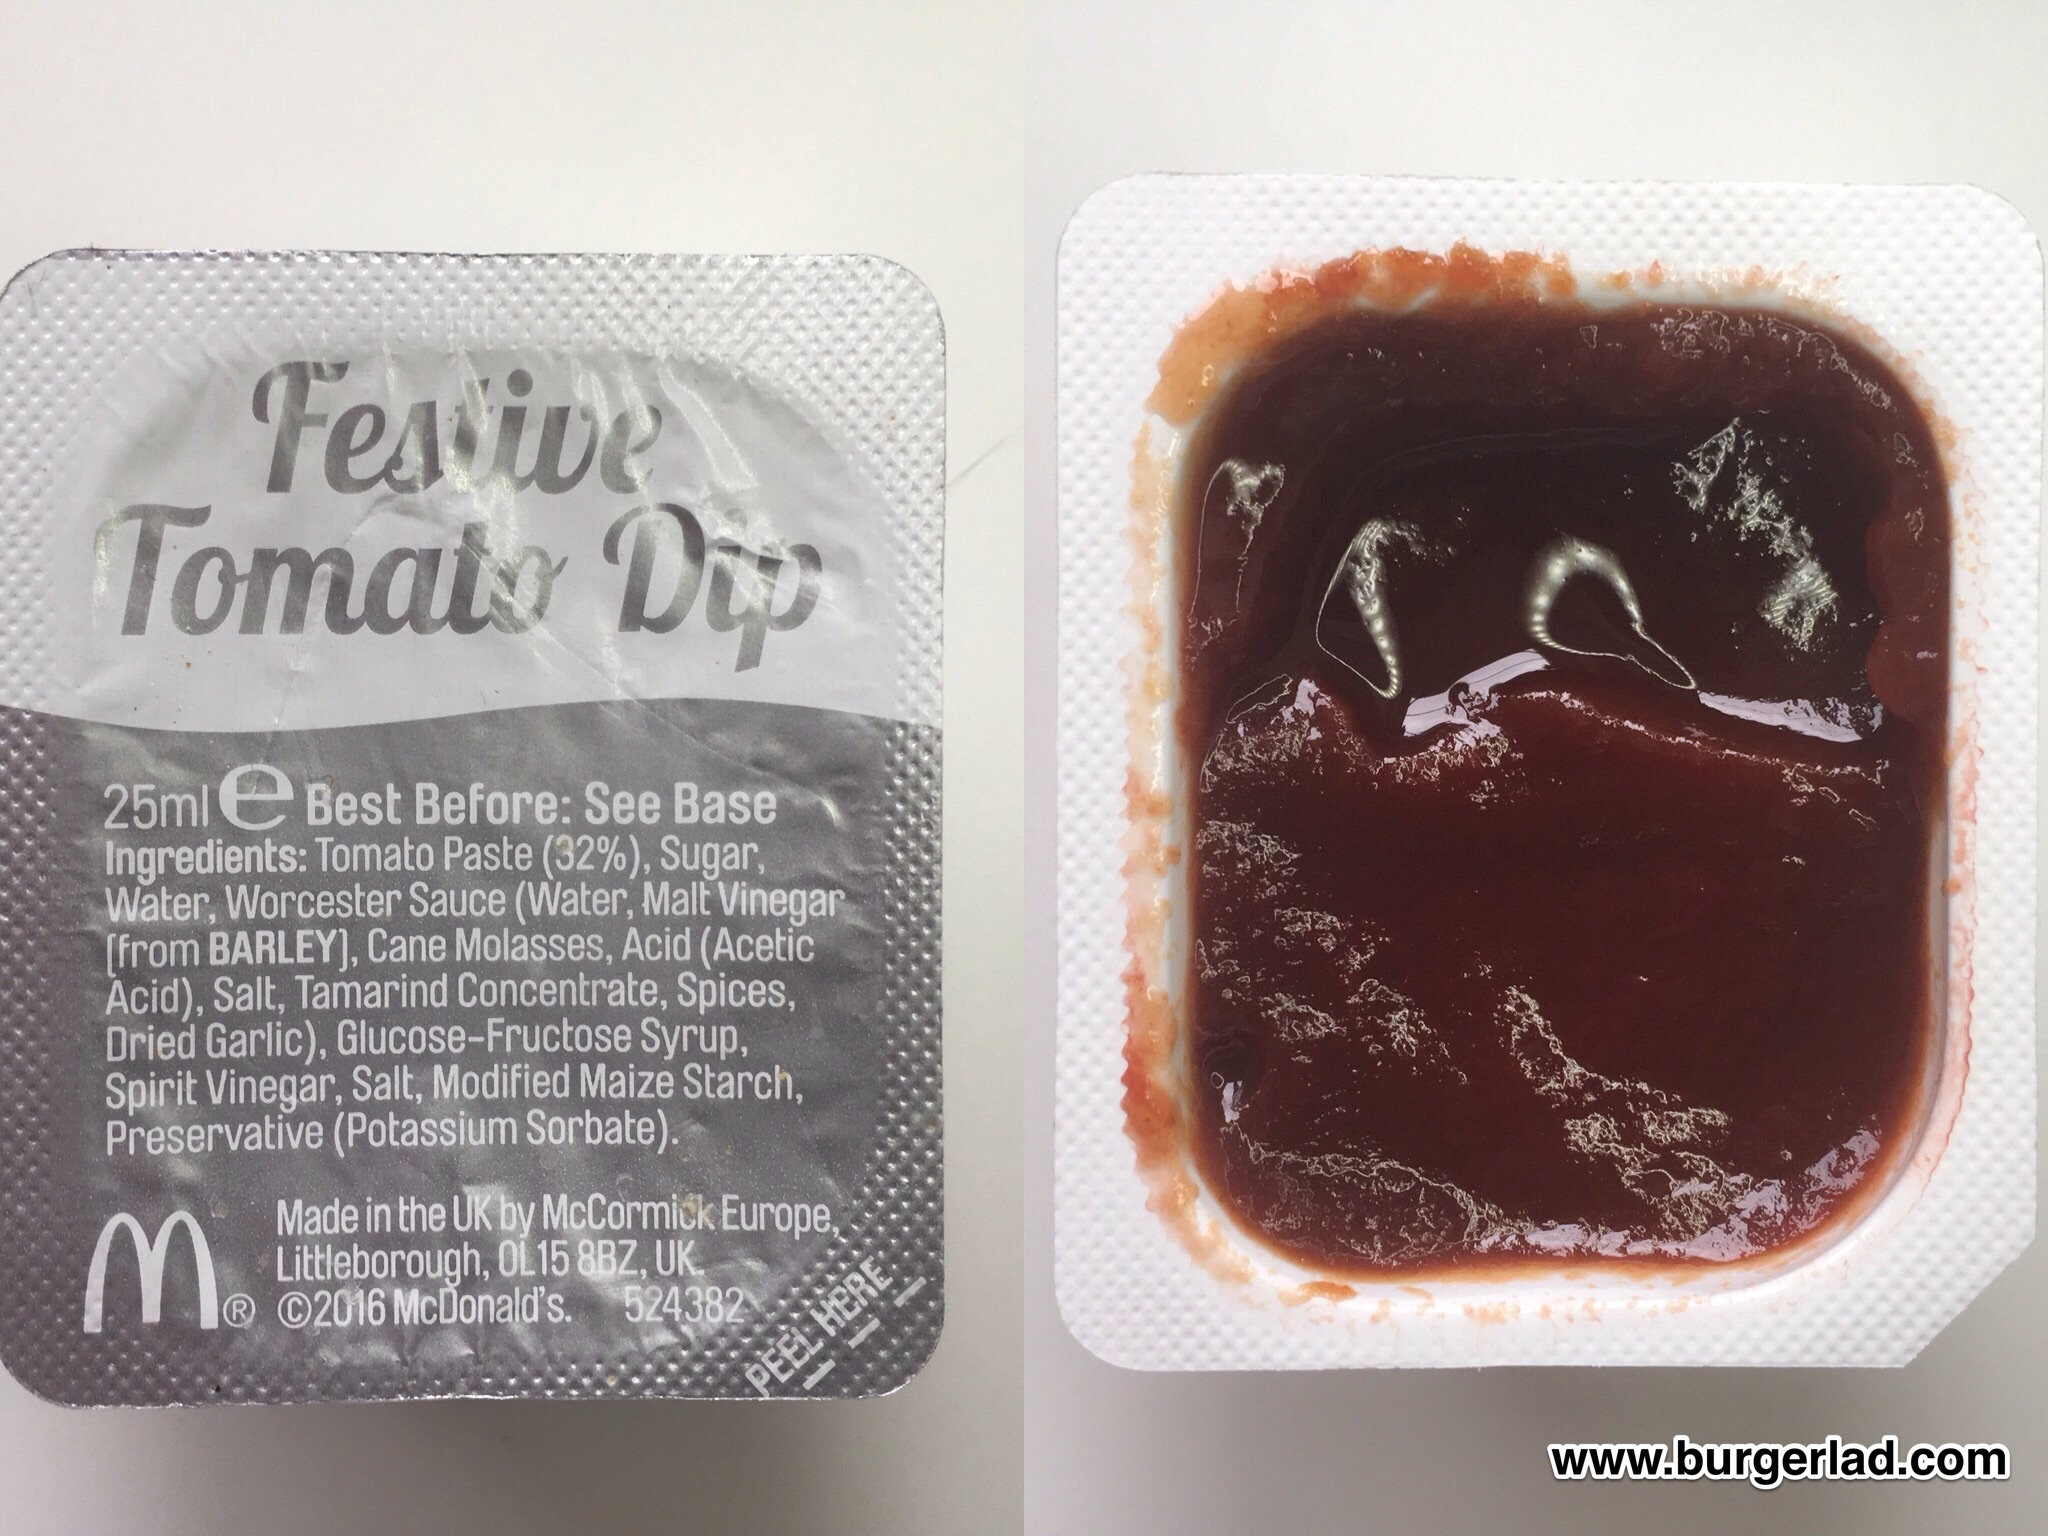 McDonald's Festive Tomato Dip